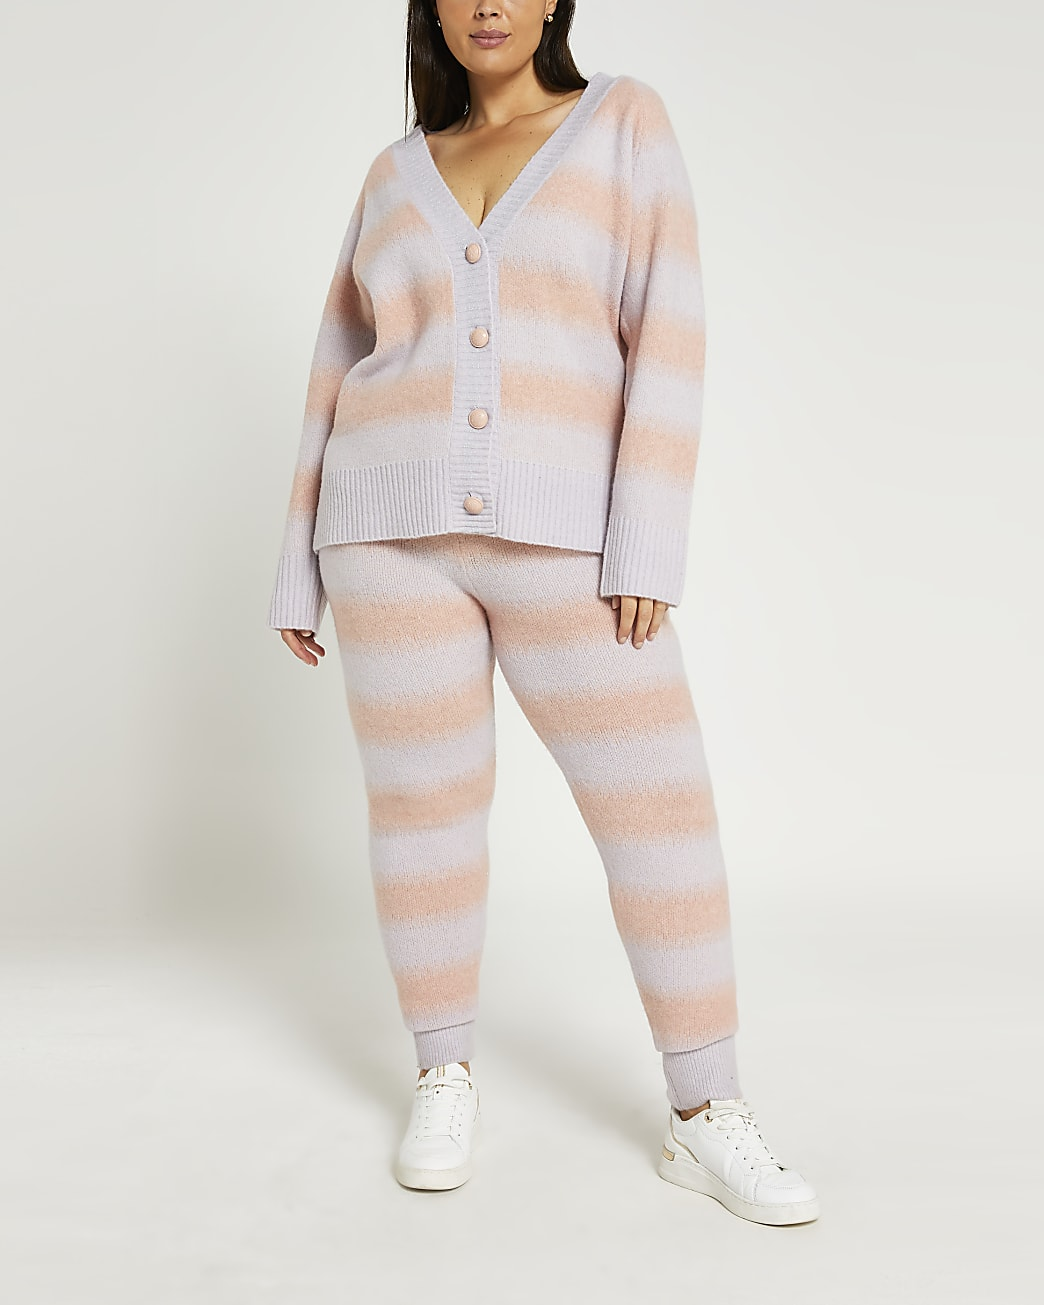 Plus pink ombre leggings